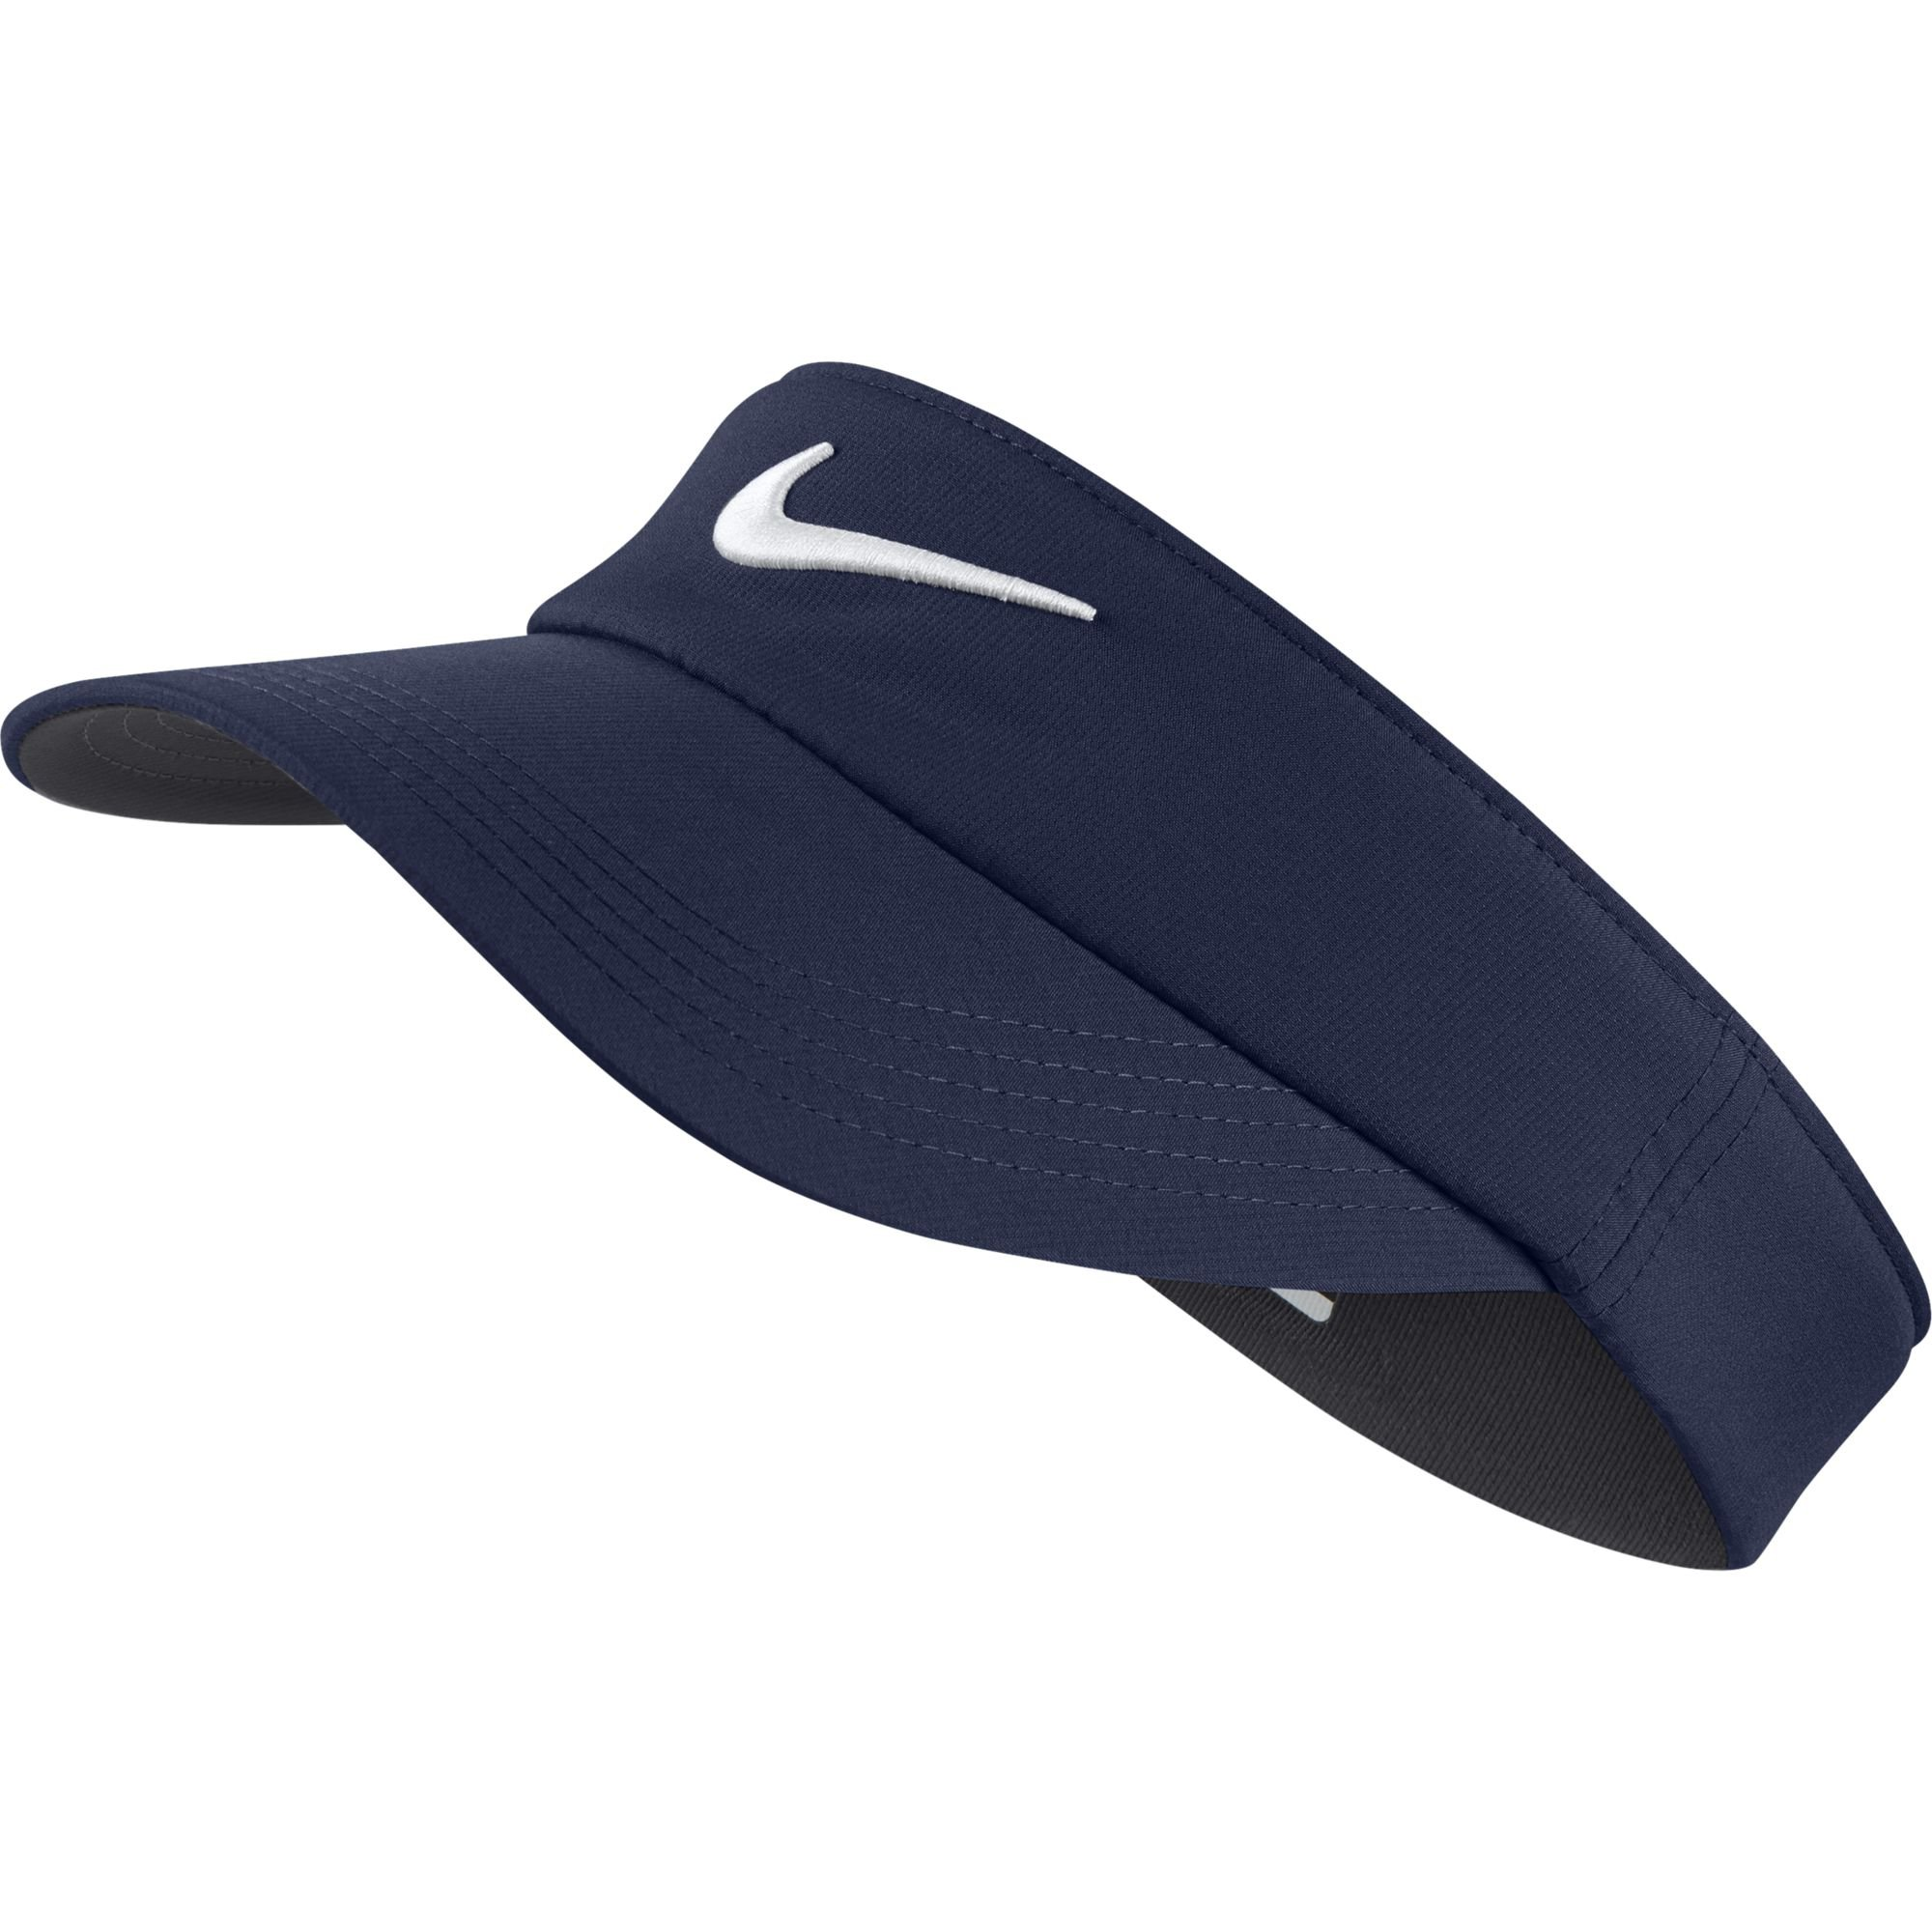 NIKE Unisex Core Golf Visor, Midnight Navy/Anthracite/White, One Size